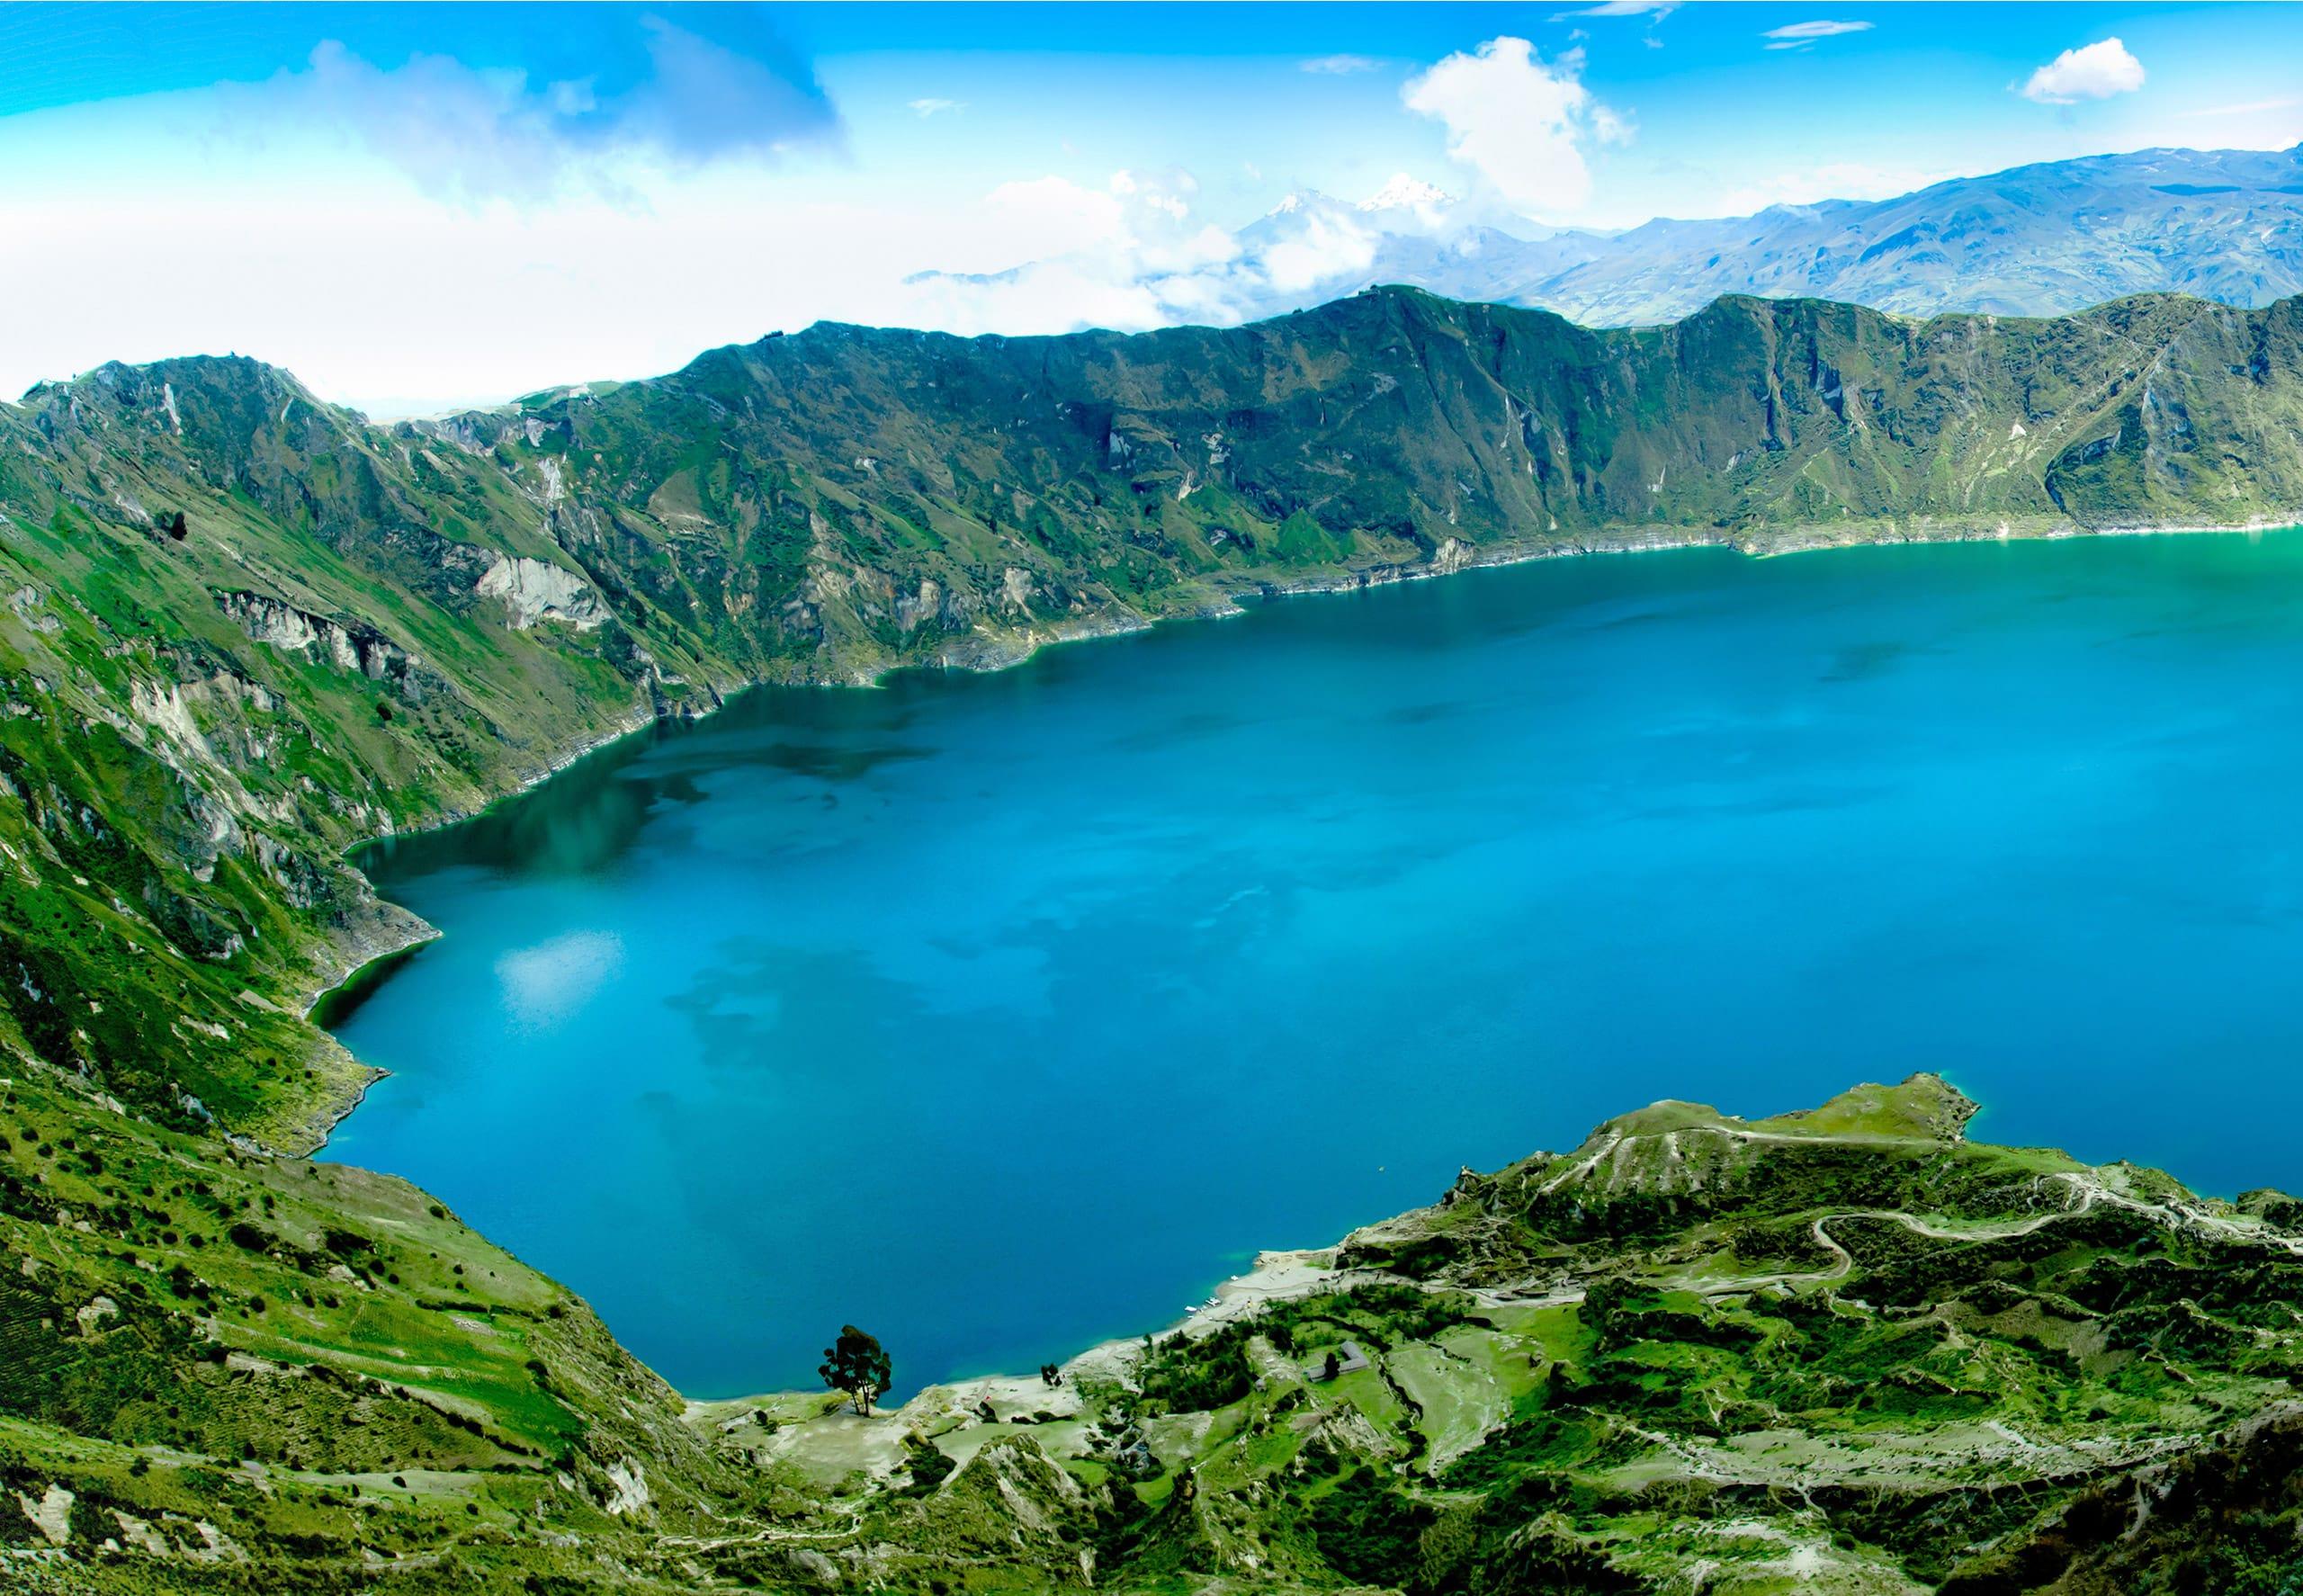 14-daagse privé rondreis diverse vervoerstypes Fantastisch Ecuador